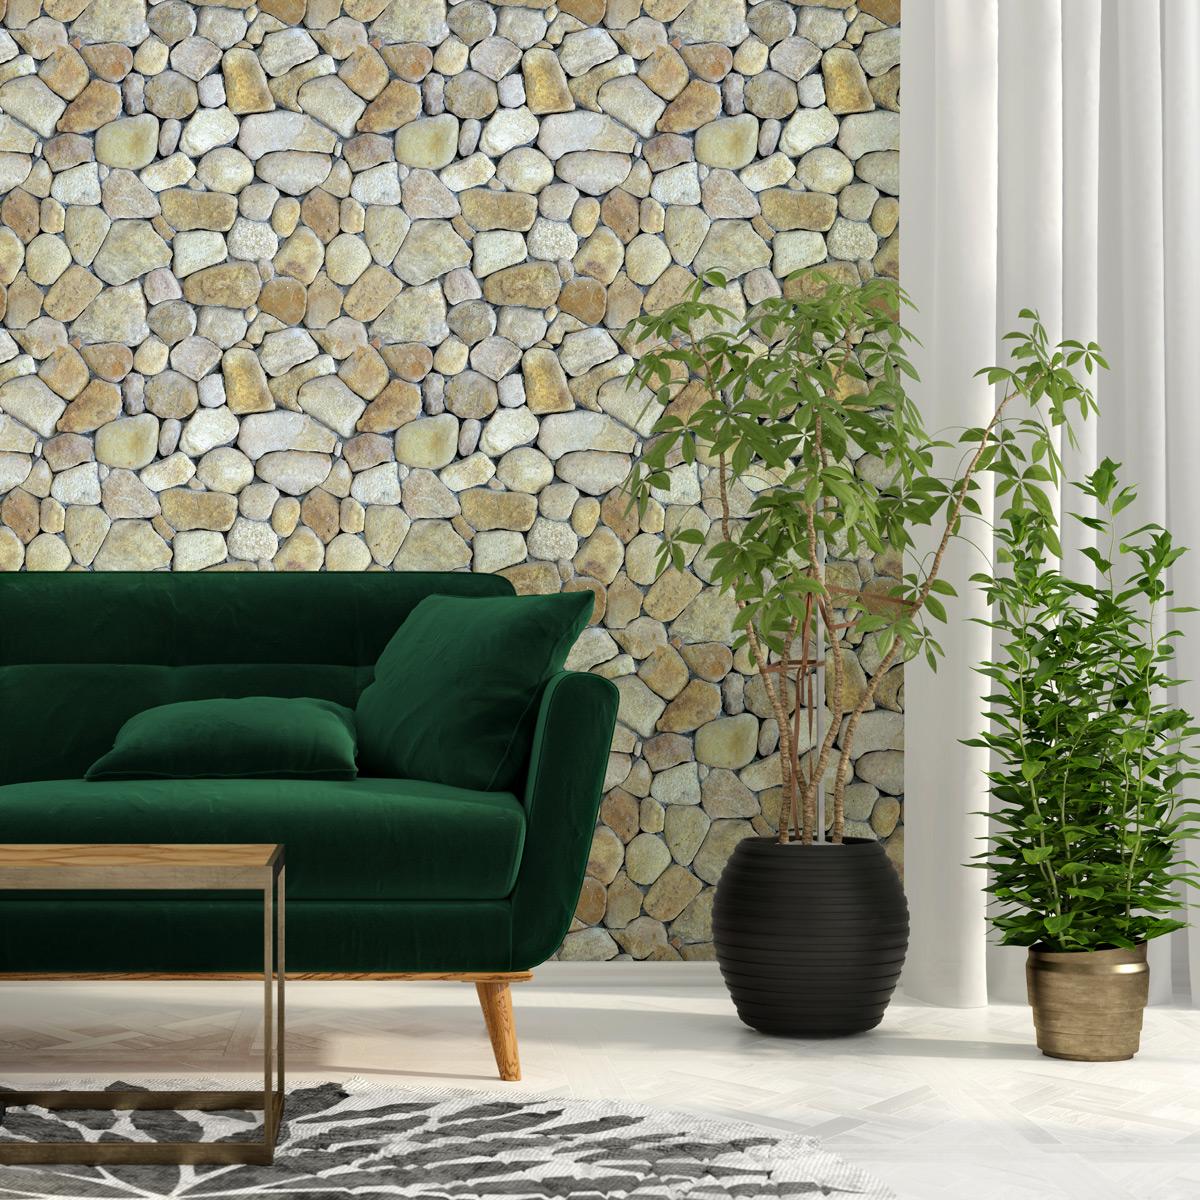 4037 3D Wall Floor Sticker Removable Drawbridge Designed Mural Decals Decor